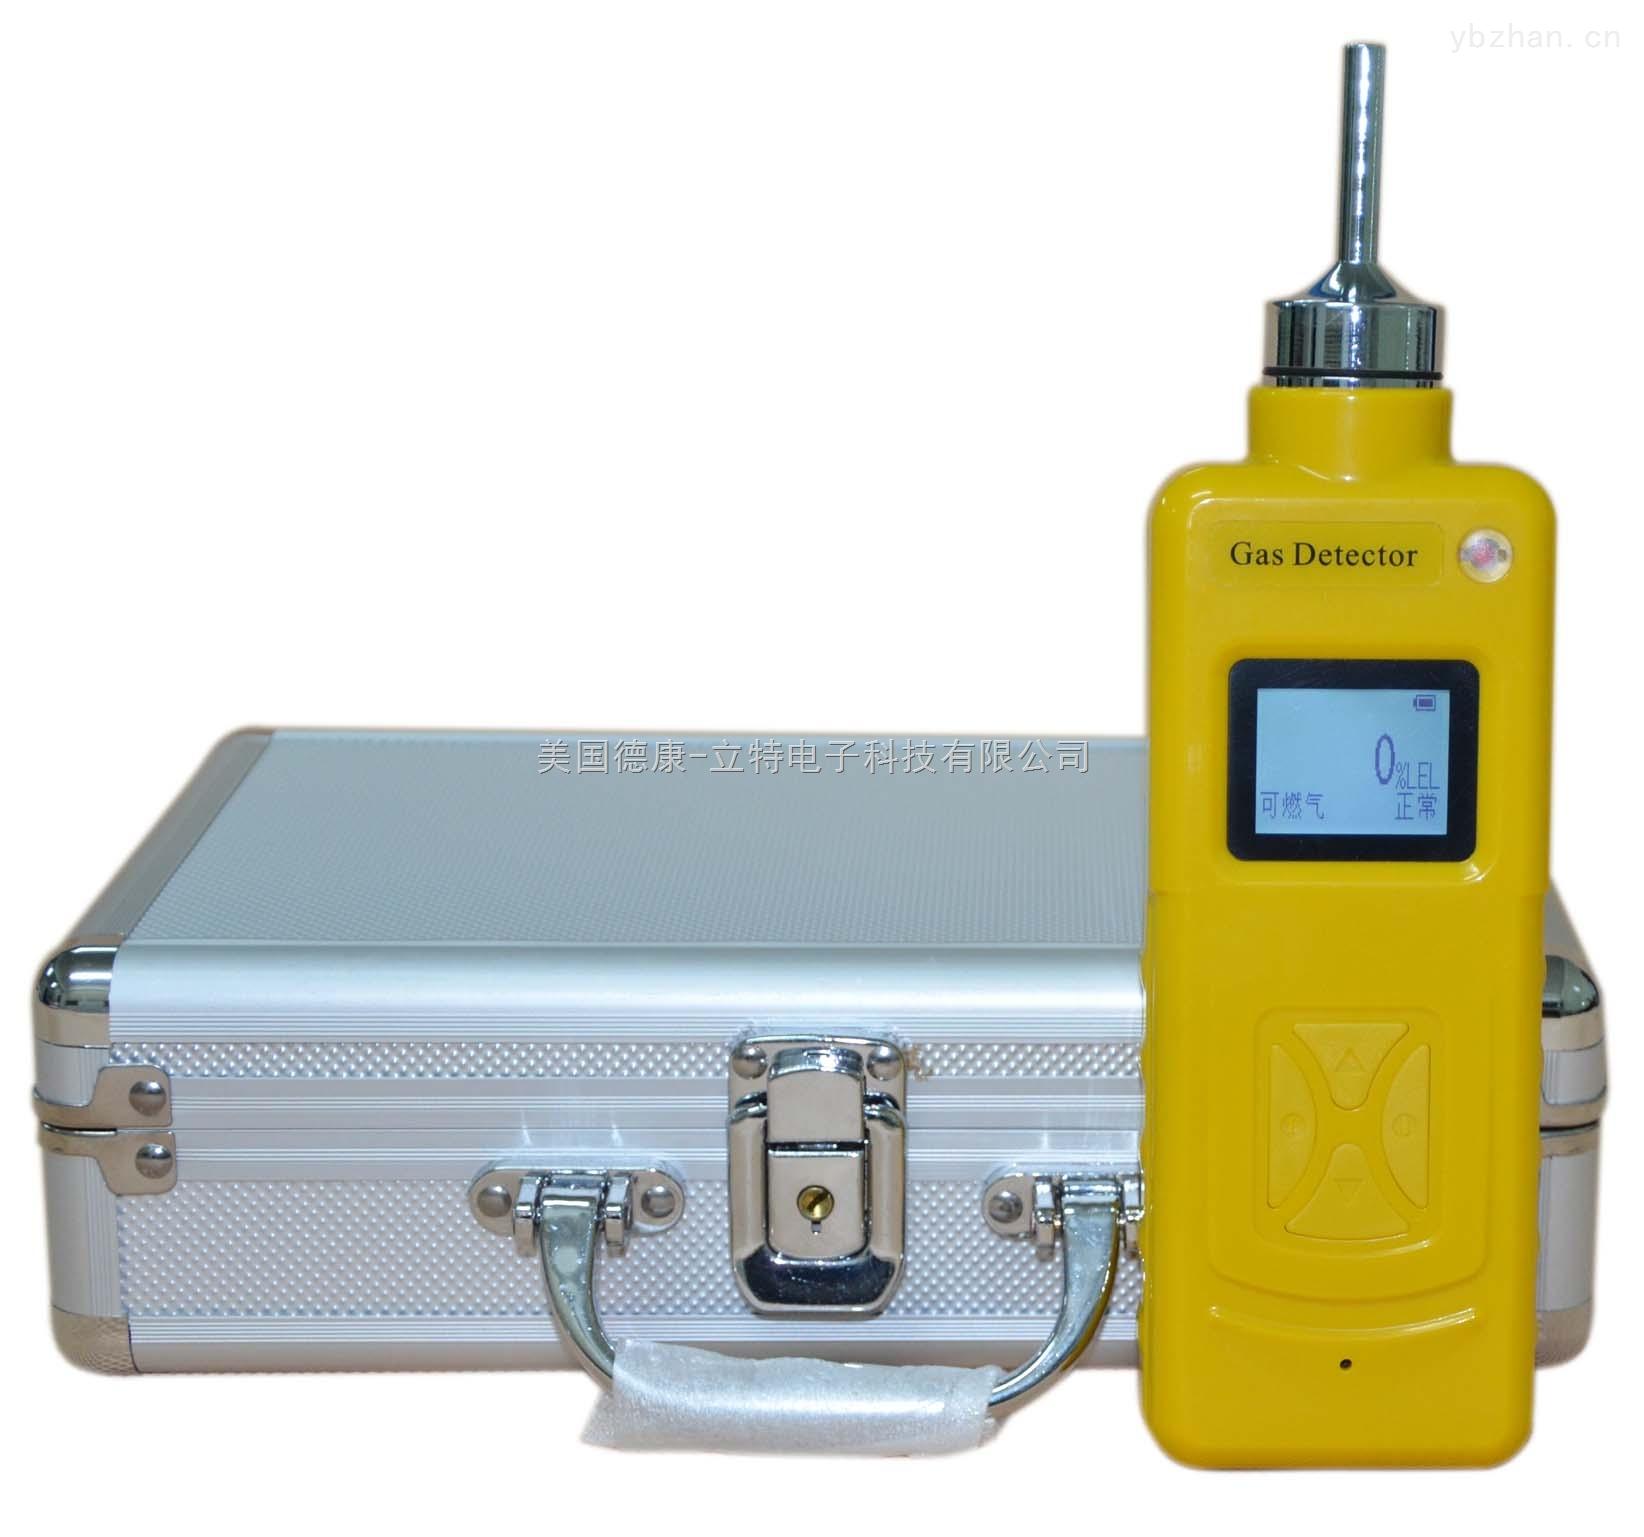 BX80+ CO2-防爆便携式二氧化碳报警仪